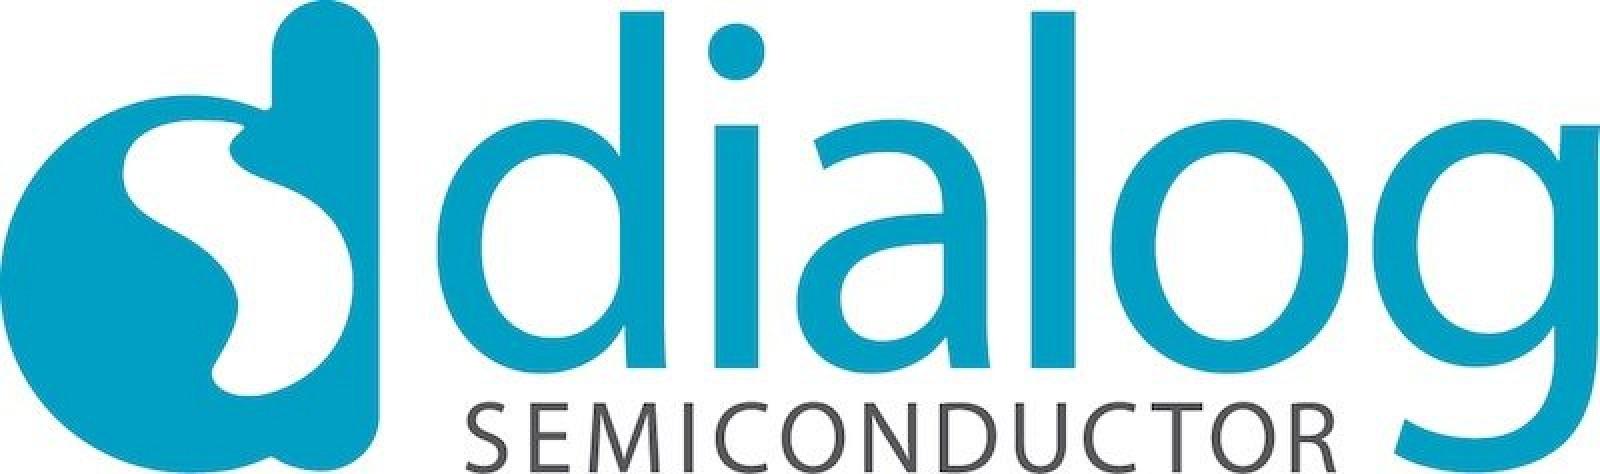 Dialog Semiconductor Aktie Realtime